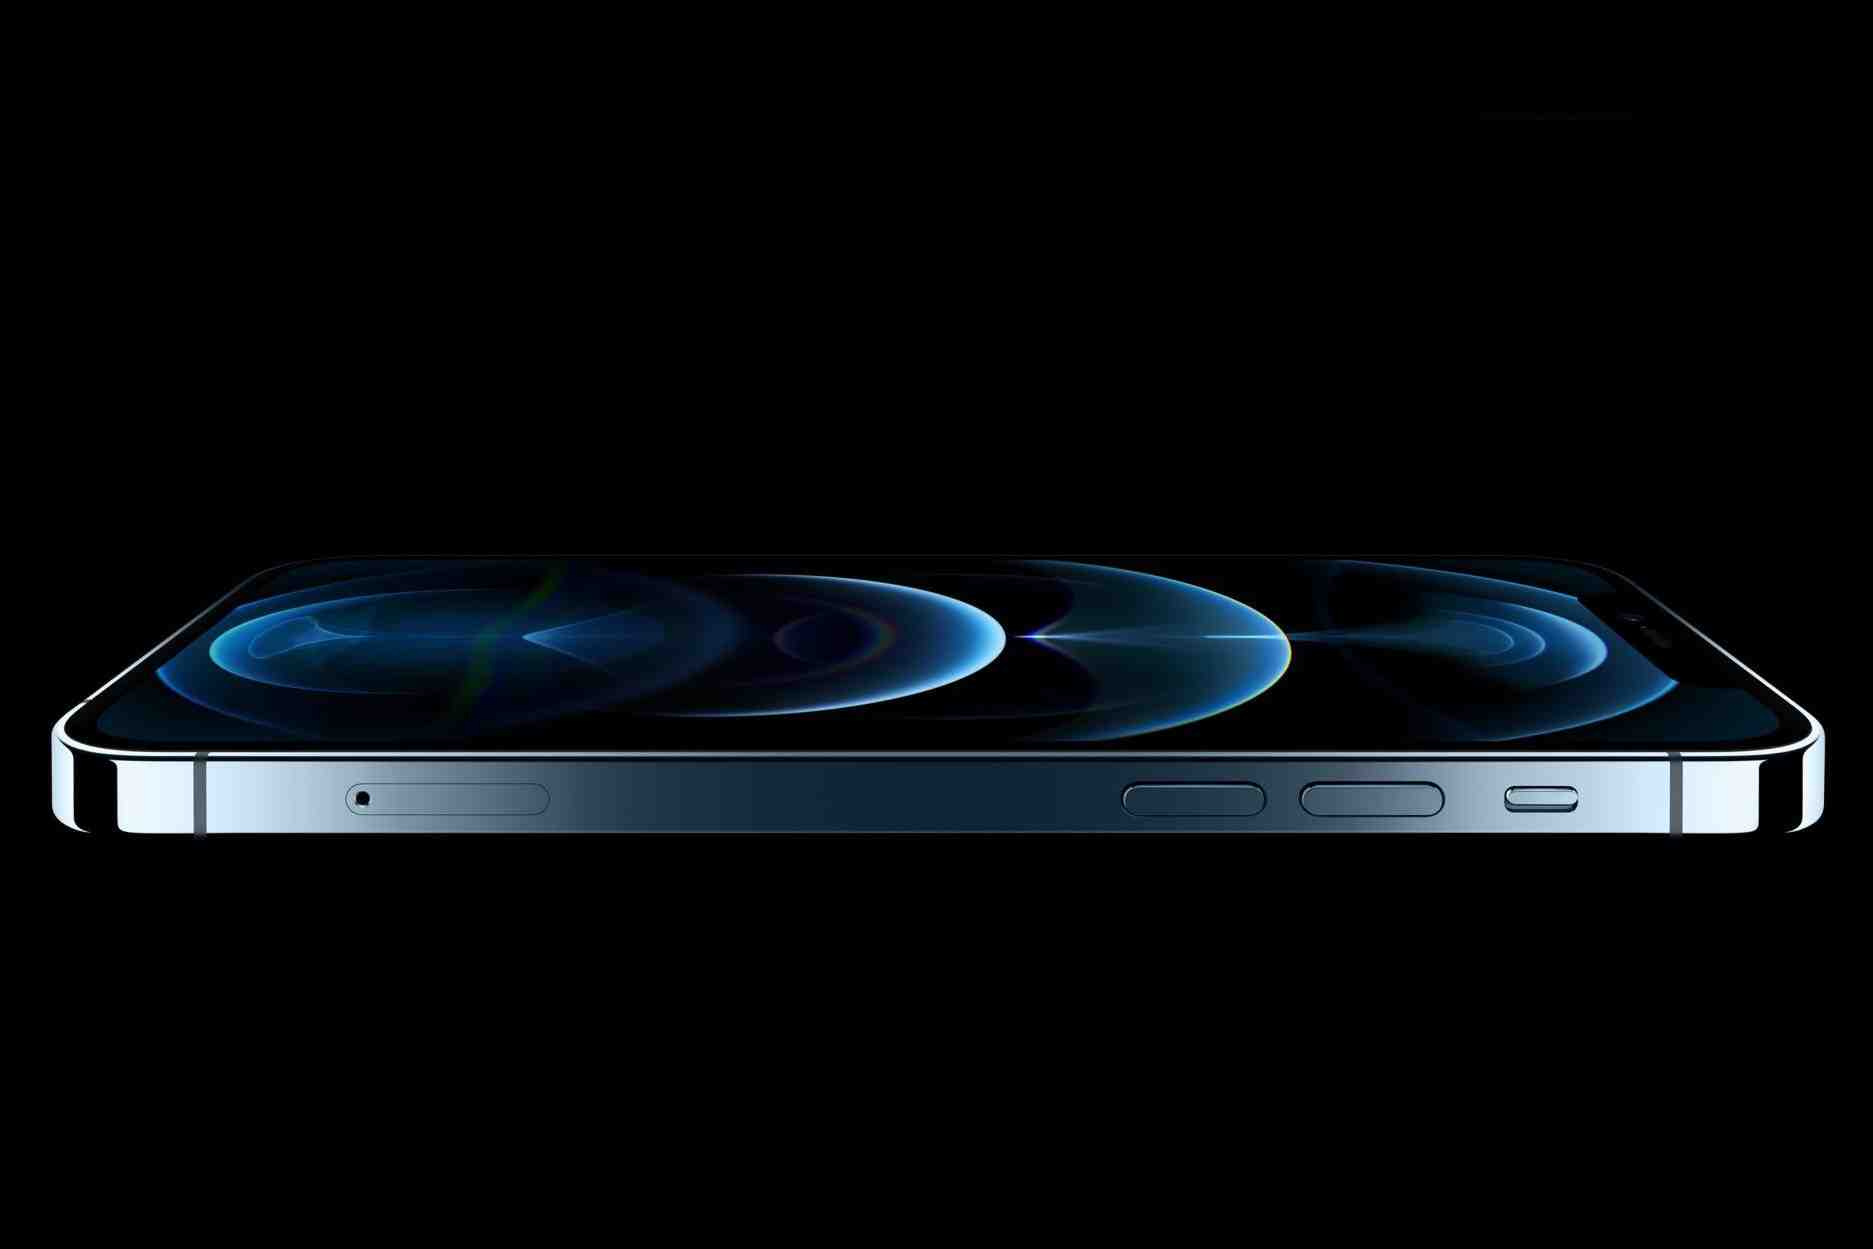 Iphone 12 pro max vodafone uk